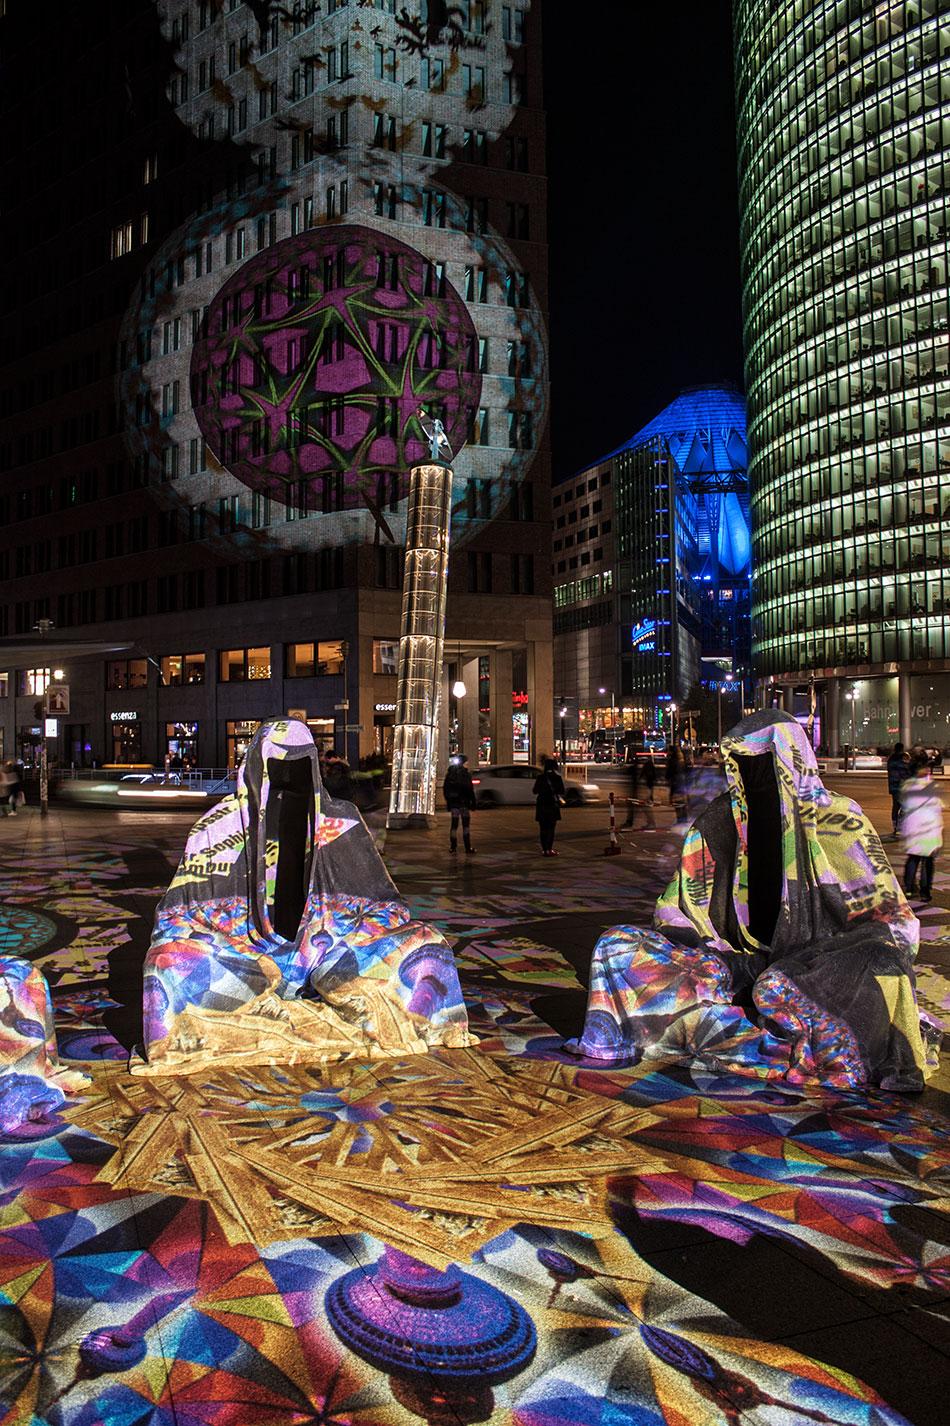 festival-of-lights-berlin-potzdamer-platz-light-art-show-exhibition-lumina-guardians-of-time-manfred-kili-kielnhofer-contemporary-arts-design-large-scale-monumental-public-sculpture-3660